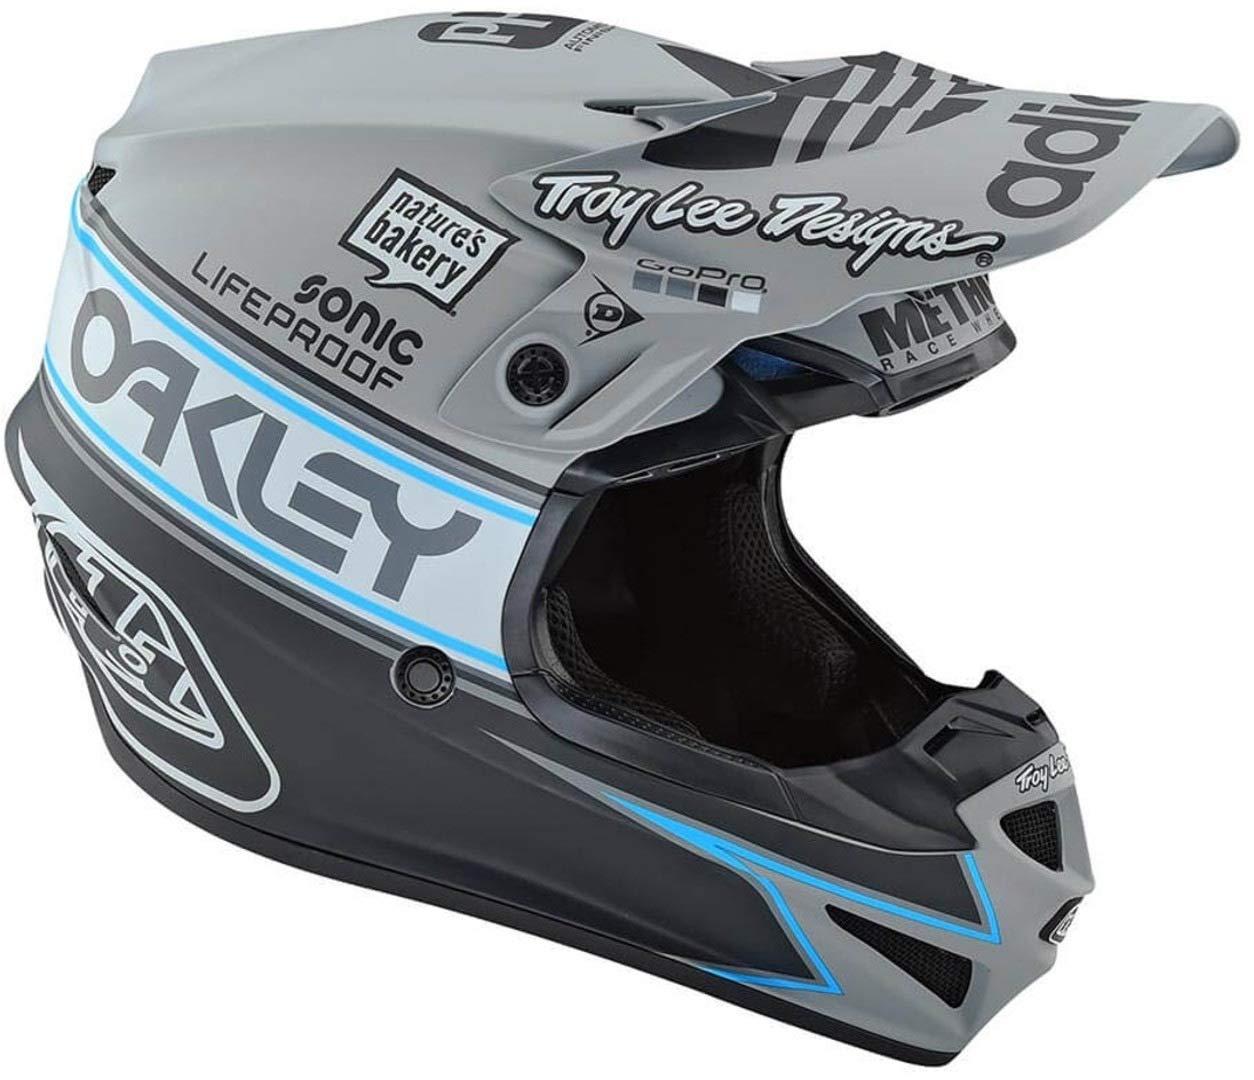 Xs, Gris Troy Lee Designs Casque Motocross 2019 Se4 Team Edition 2 Polyacrylite Gris